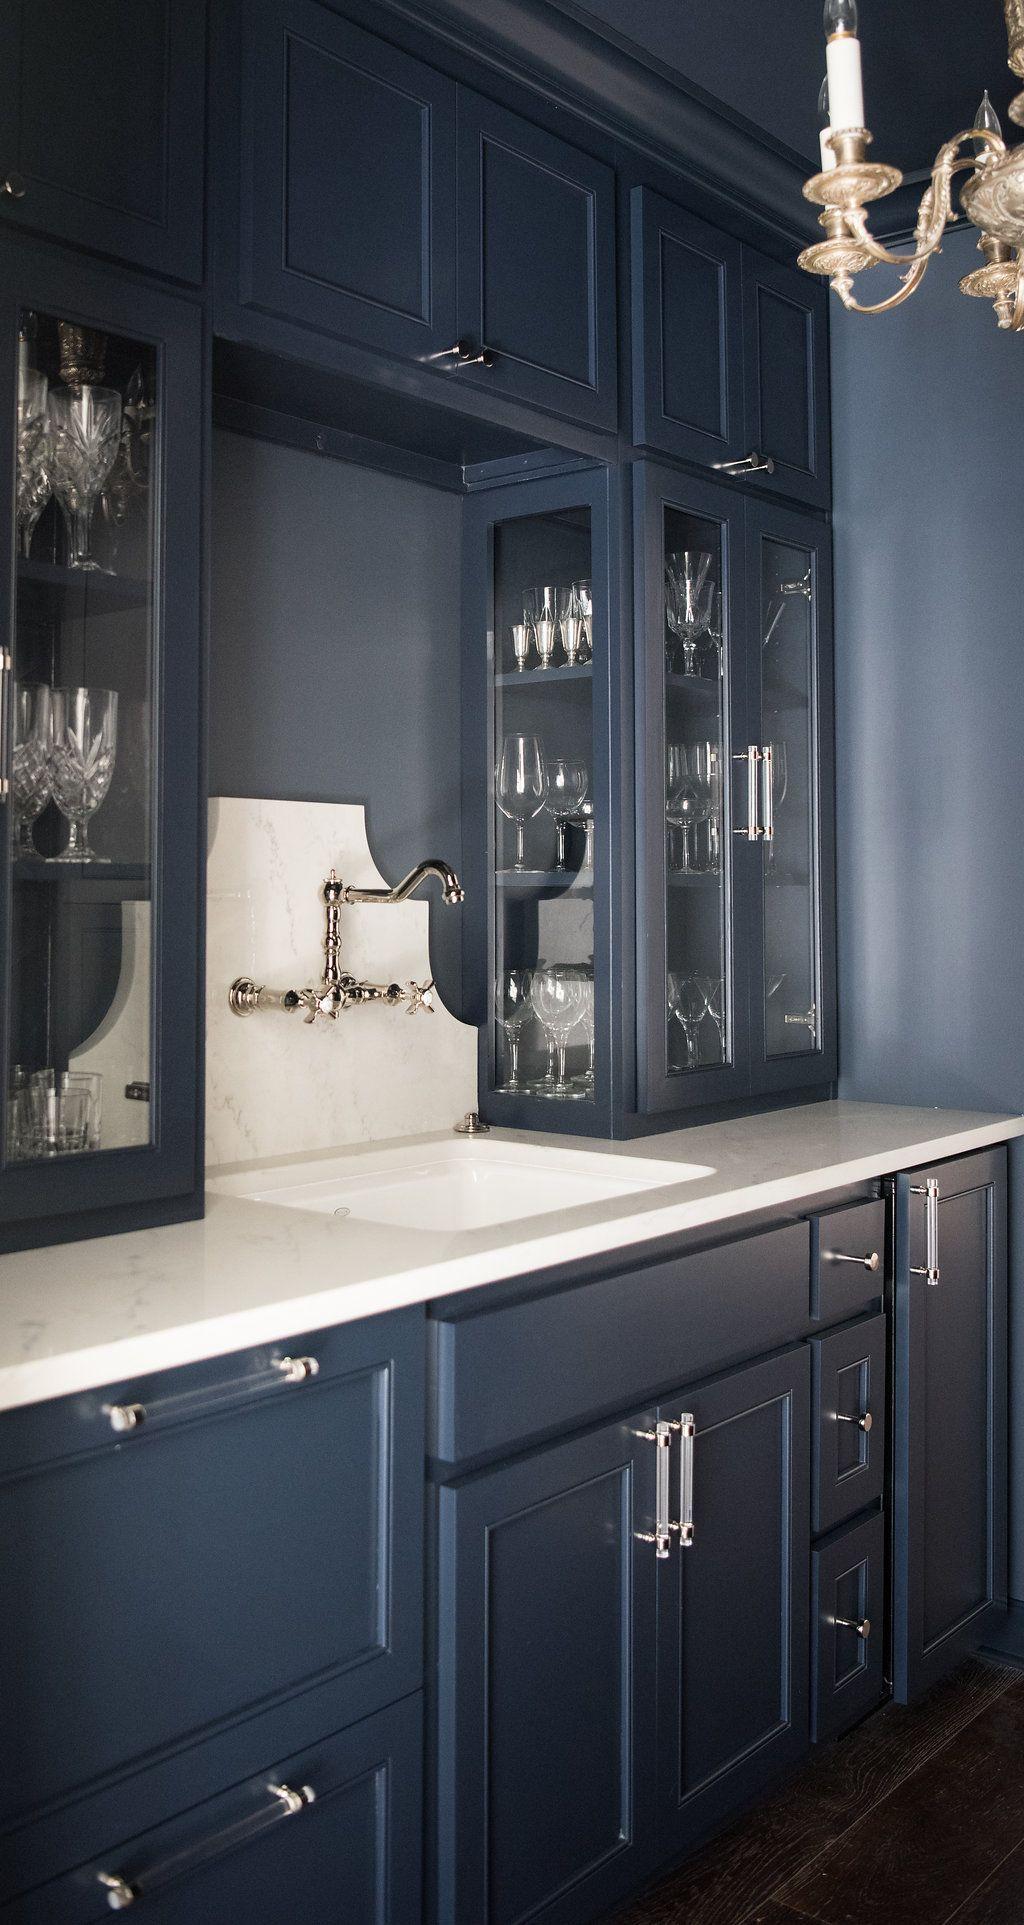 classic benjamin moore paint colors navy blue kitchen on benjamin moore kitchen cabinet paint id=88185